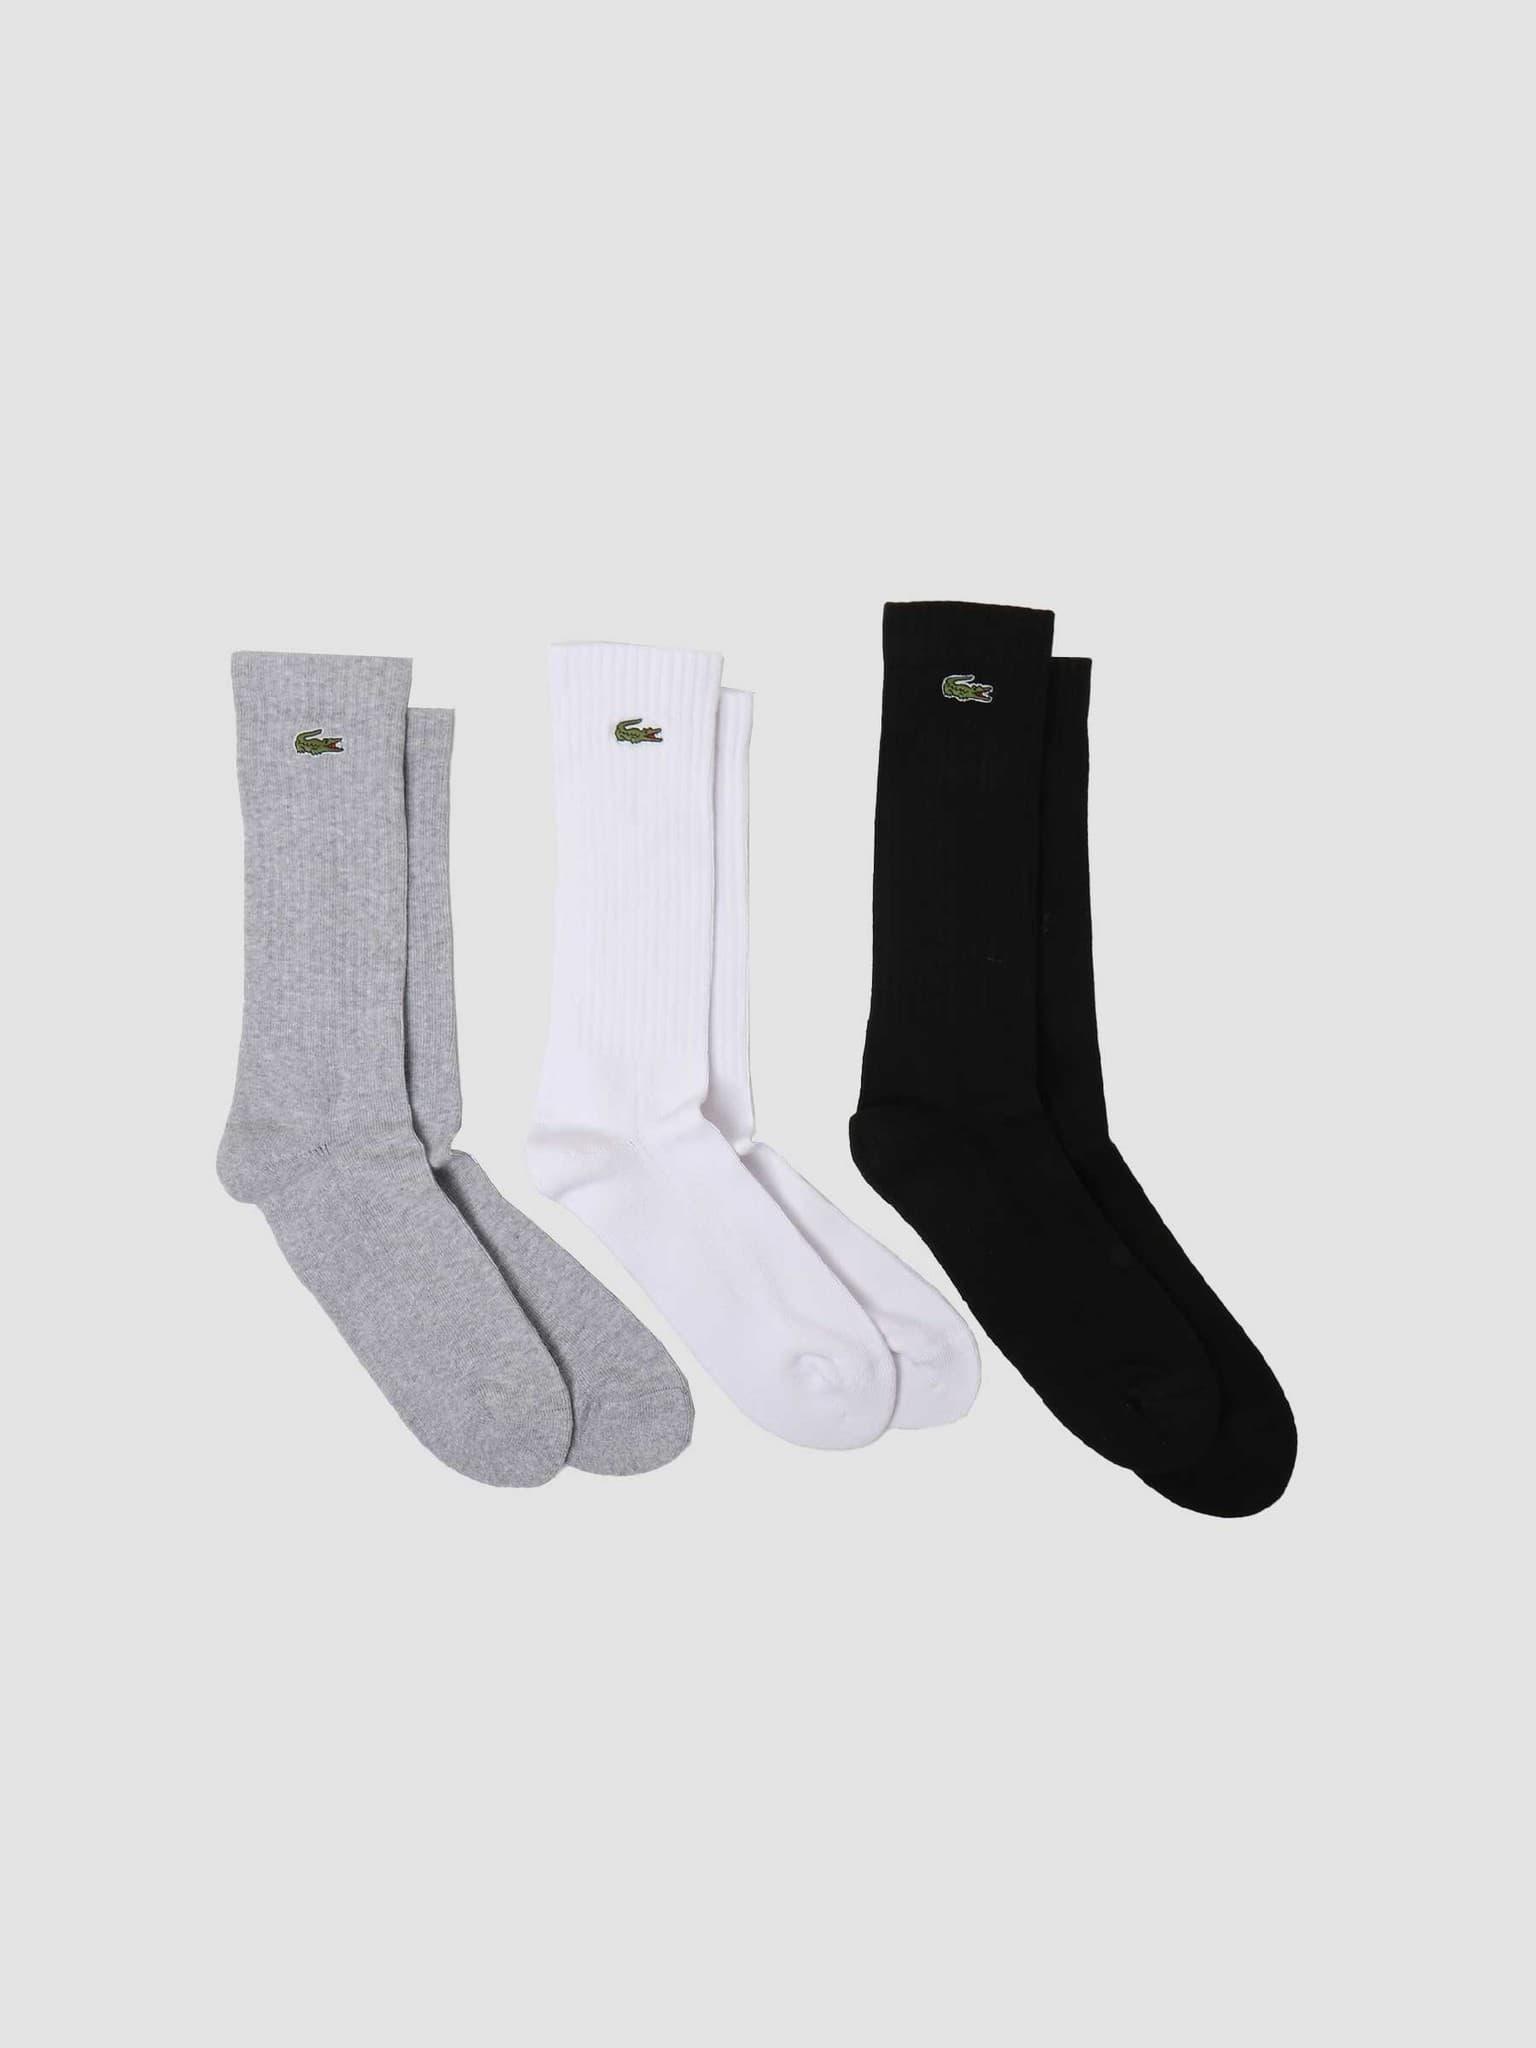 2G1C Socks 11 Silver Chine White Black RA2099-11